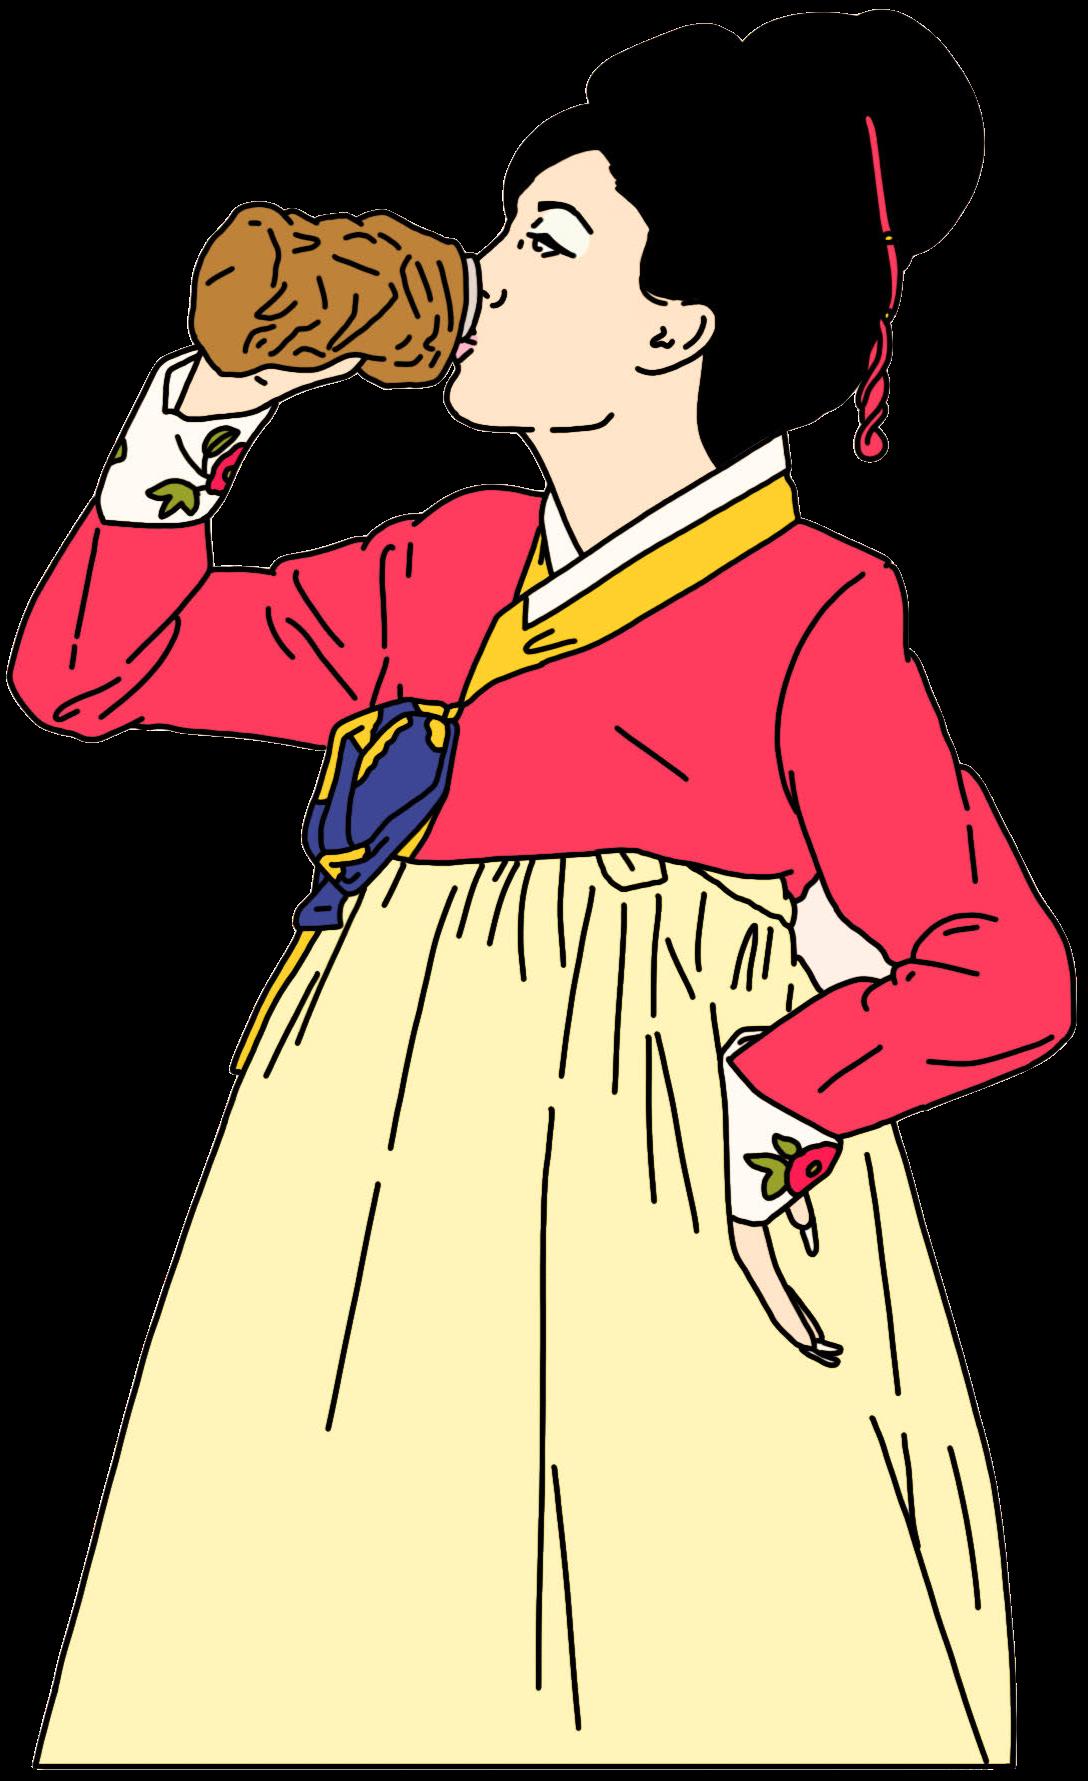 Illustration by Faye Orlove, found @ Japanese Breakfast's Website: http://japanesebreakfast.rocks/